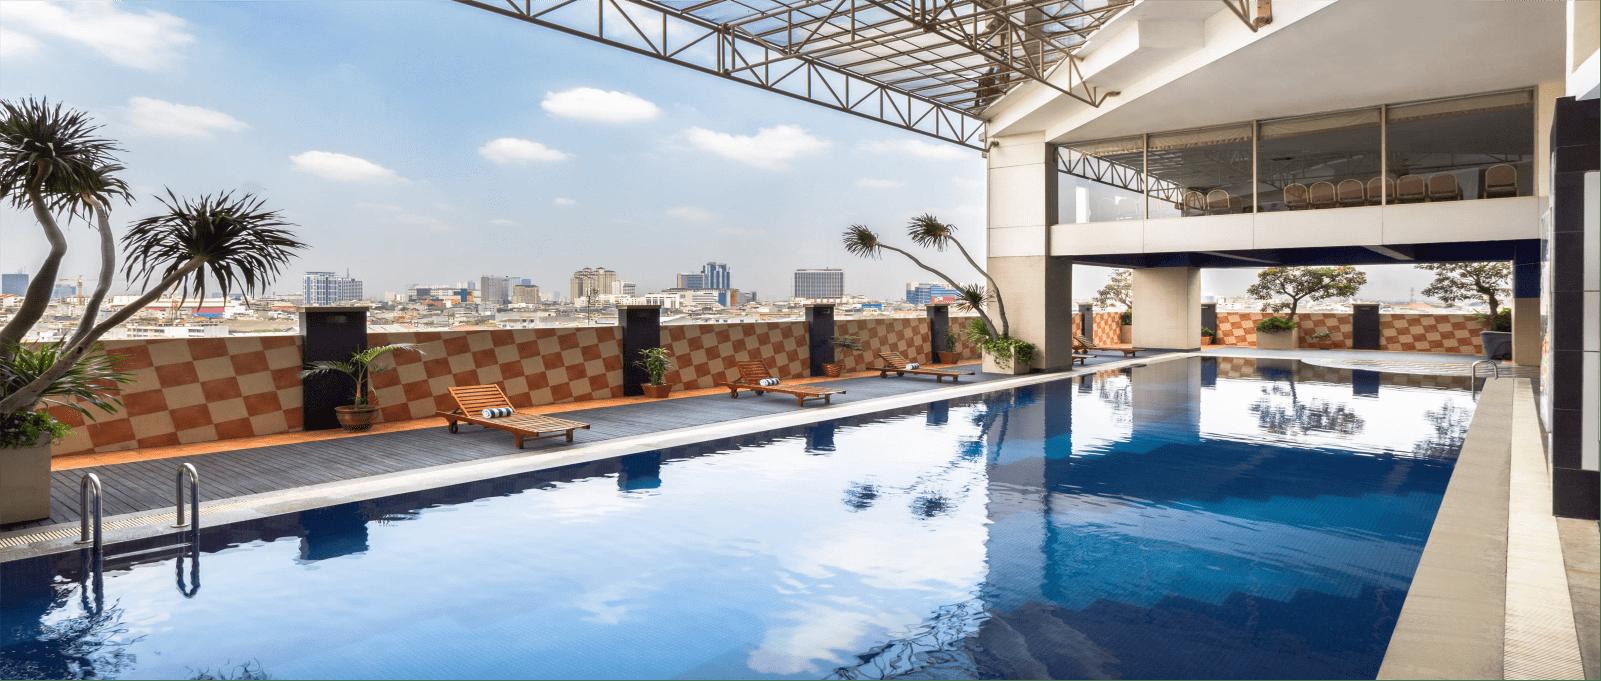 Best Western Mangga Dua Hotel Residence Indonesia Voucher Jakarta Online Reservation